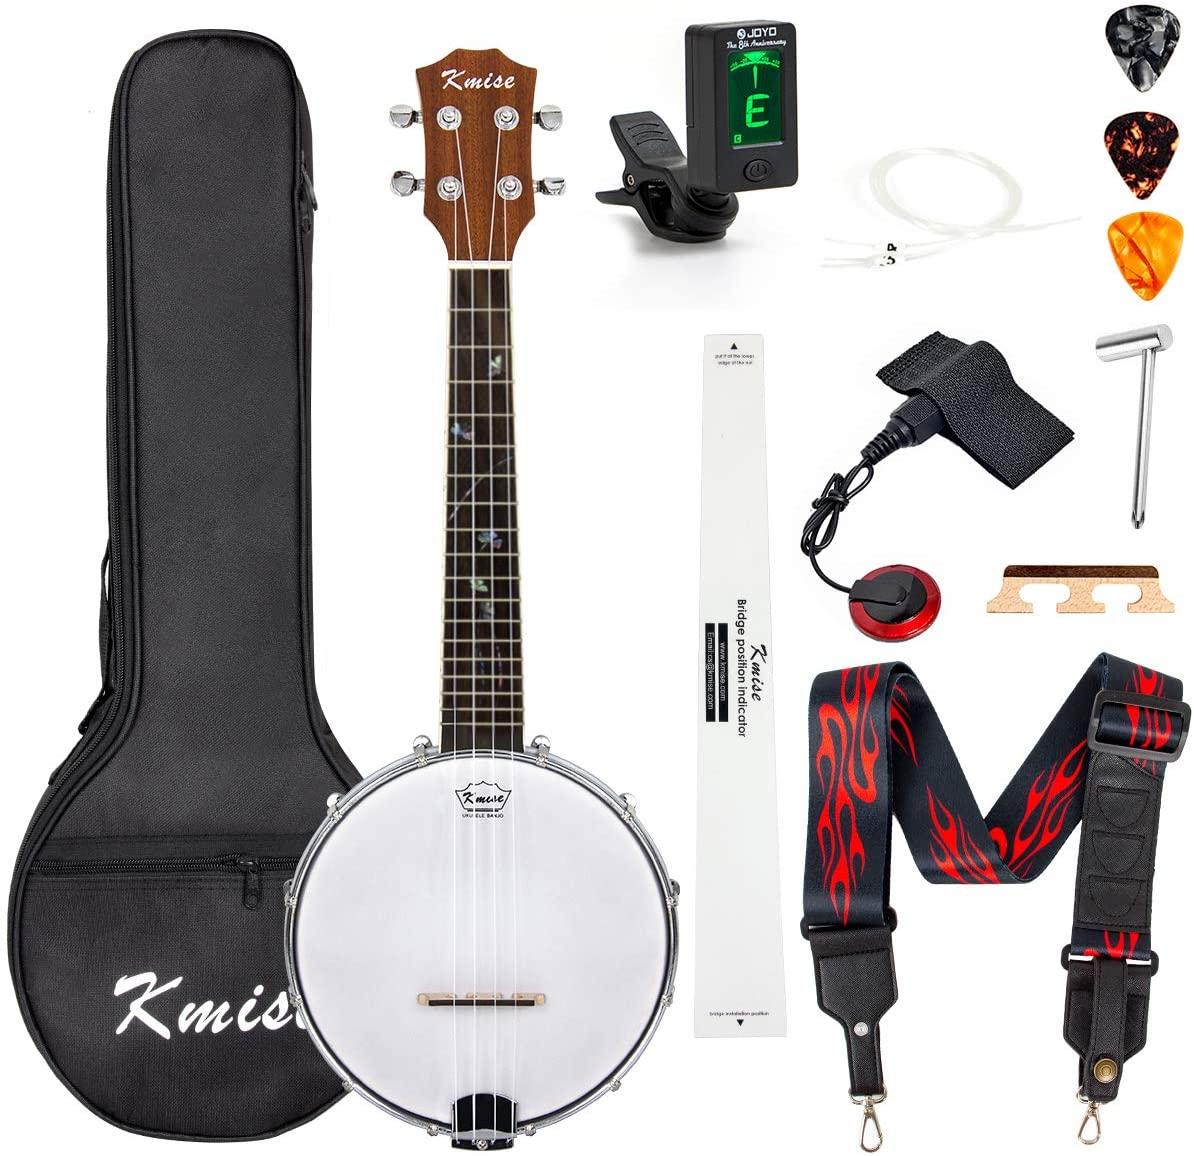 Banjo Ukulele Concert Size 23 Inch With Bag Tuner Strap Strings Pickup Picks Ruler Wrench Bridge